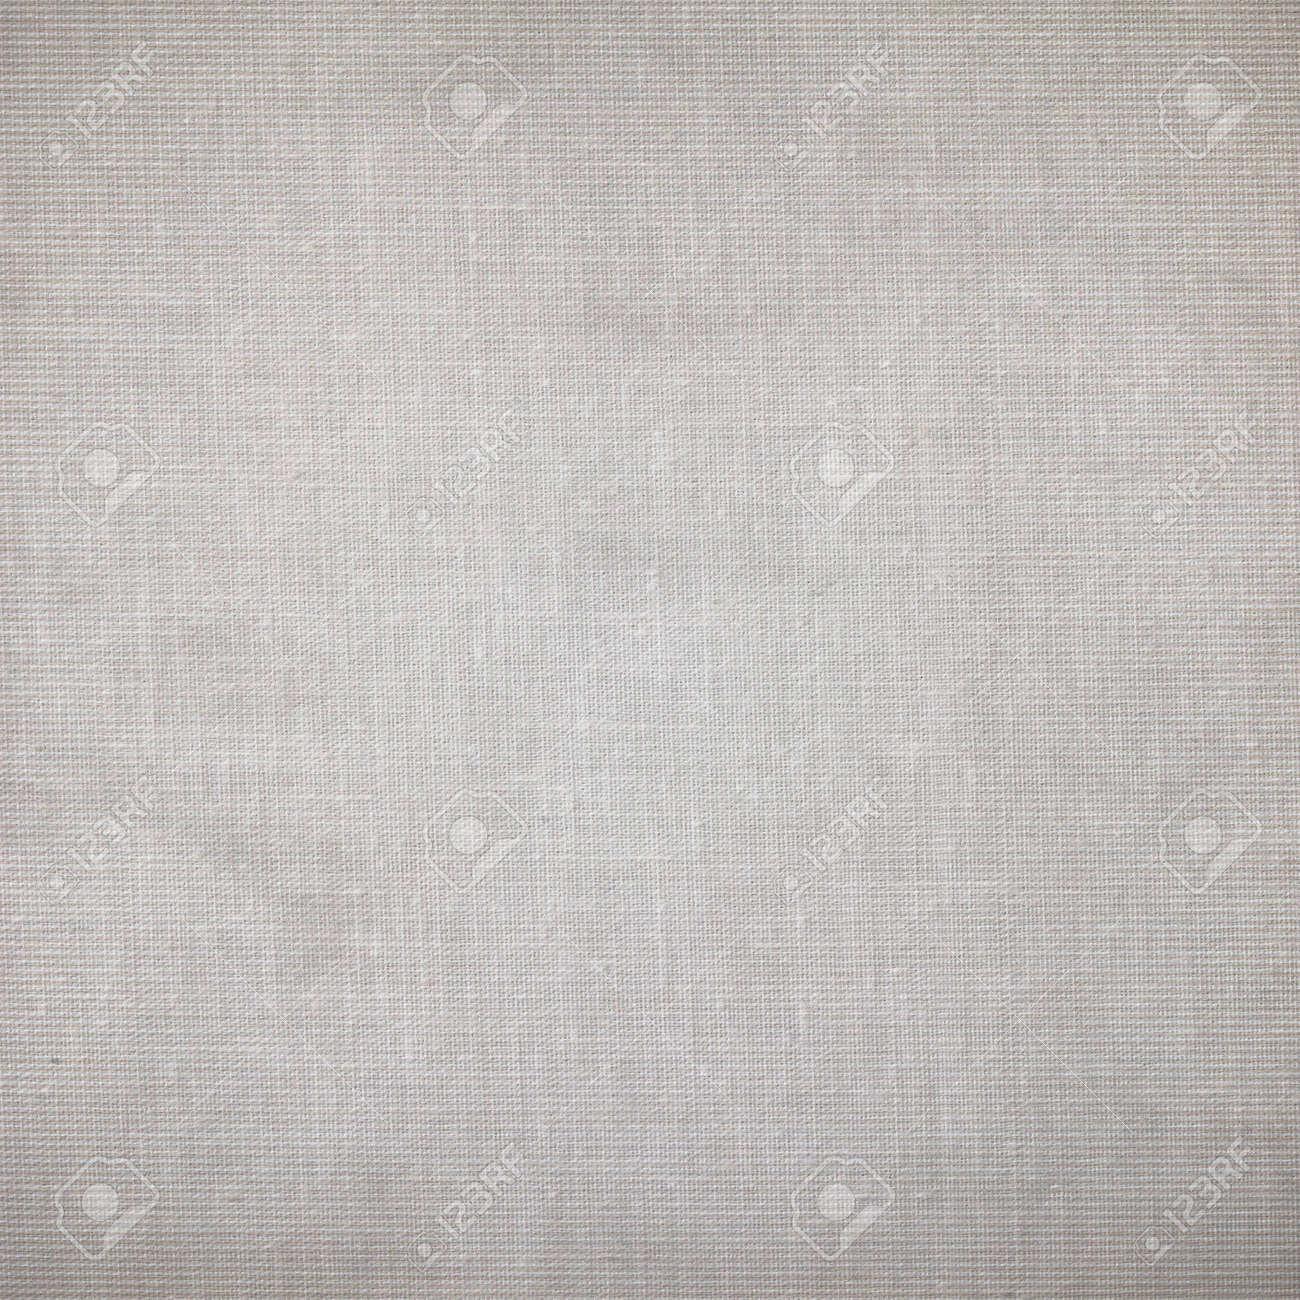 Old Linen Canvas Texture Background Parchment Paper Stock Photo